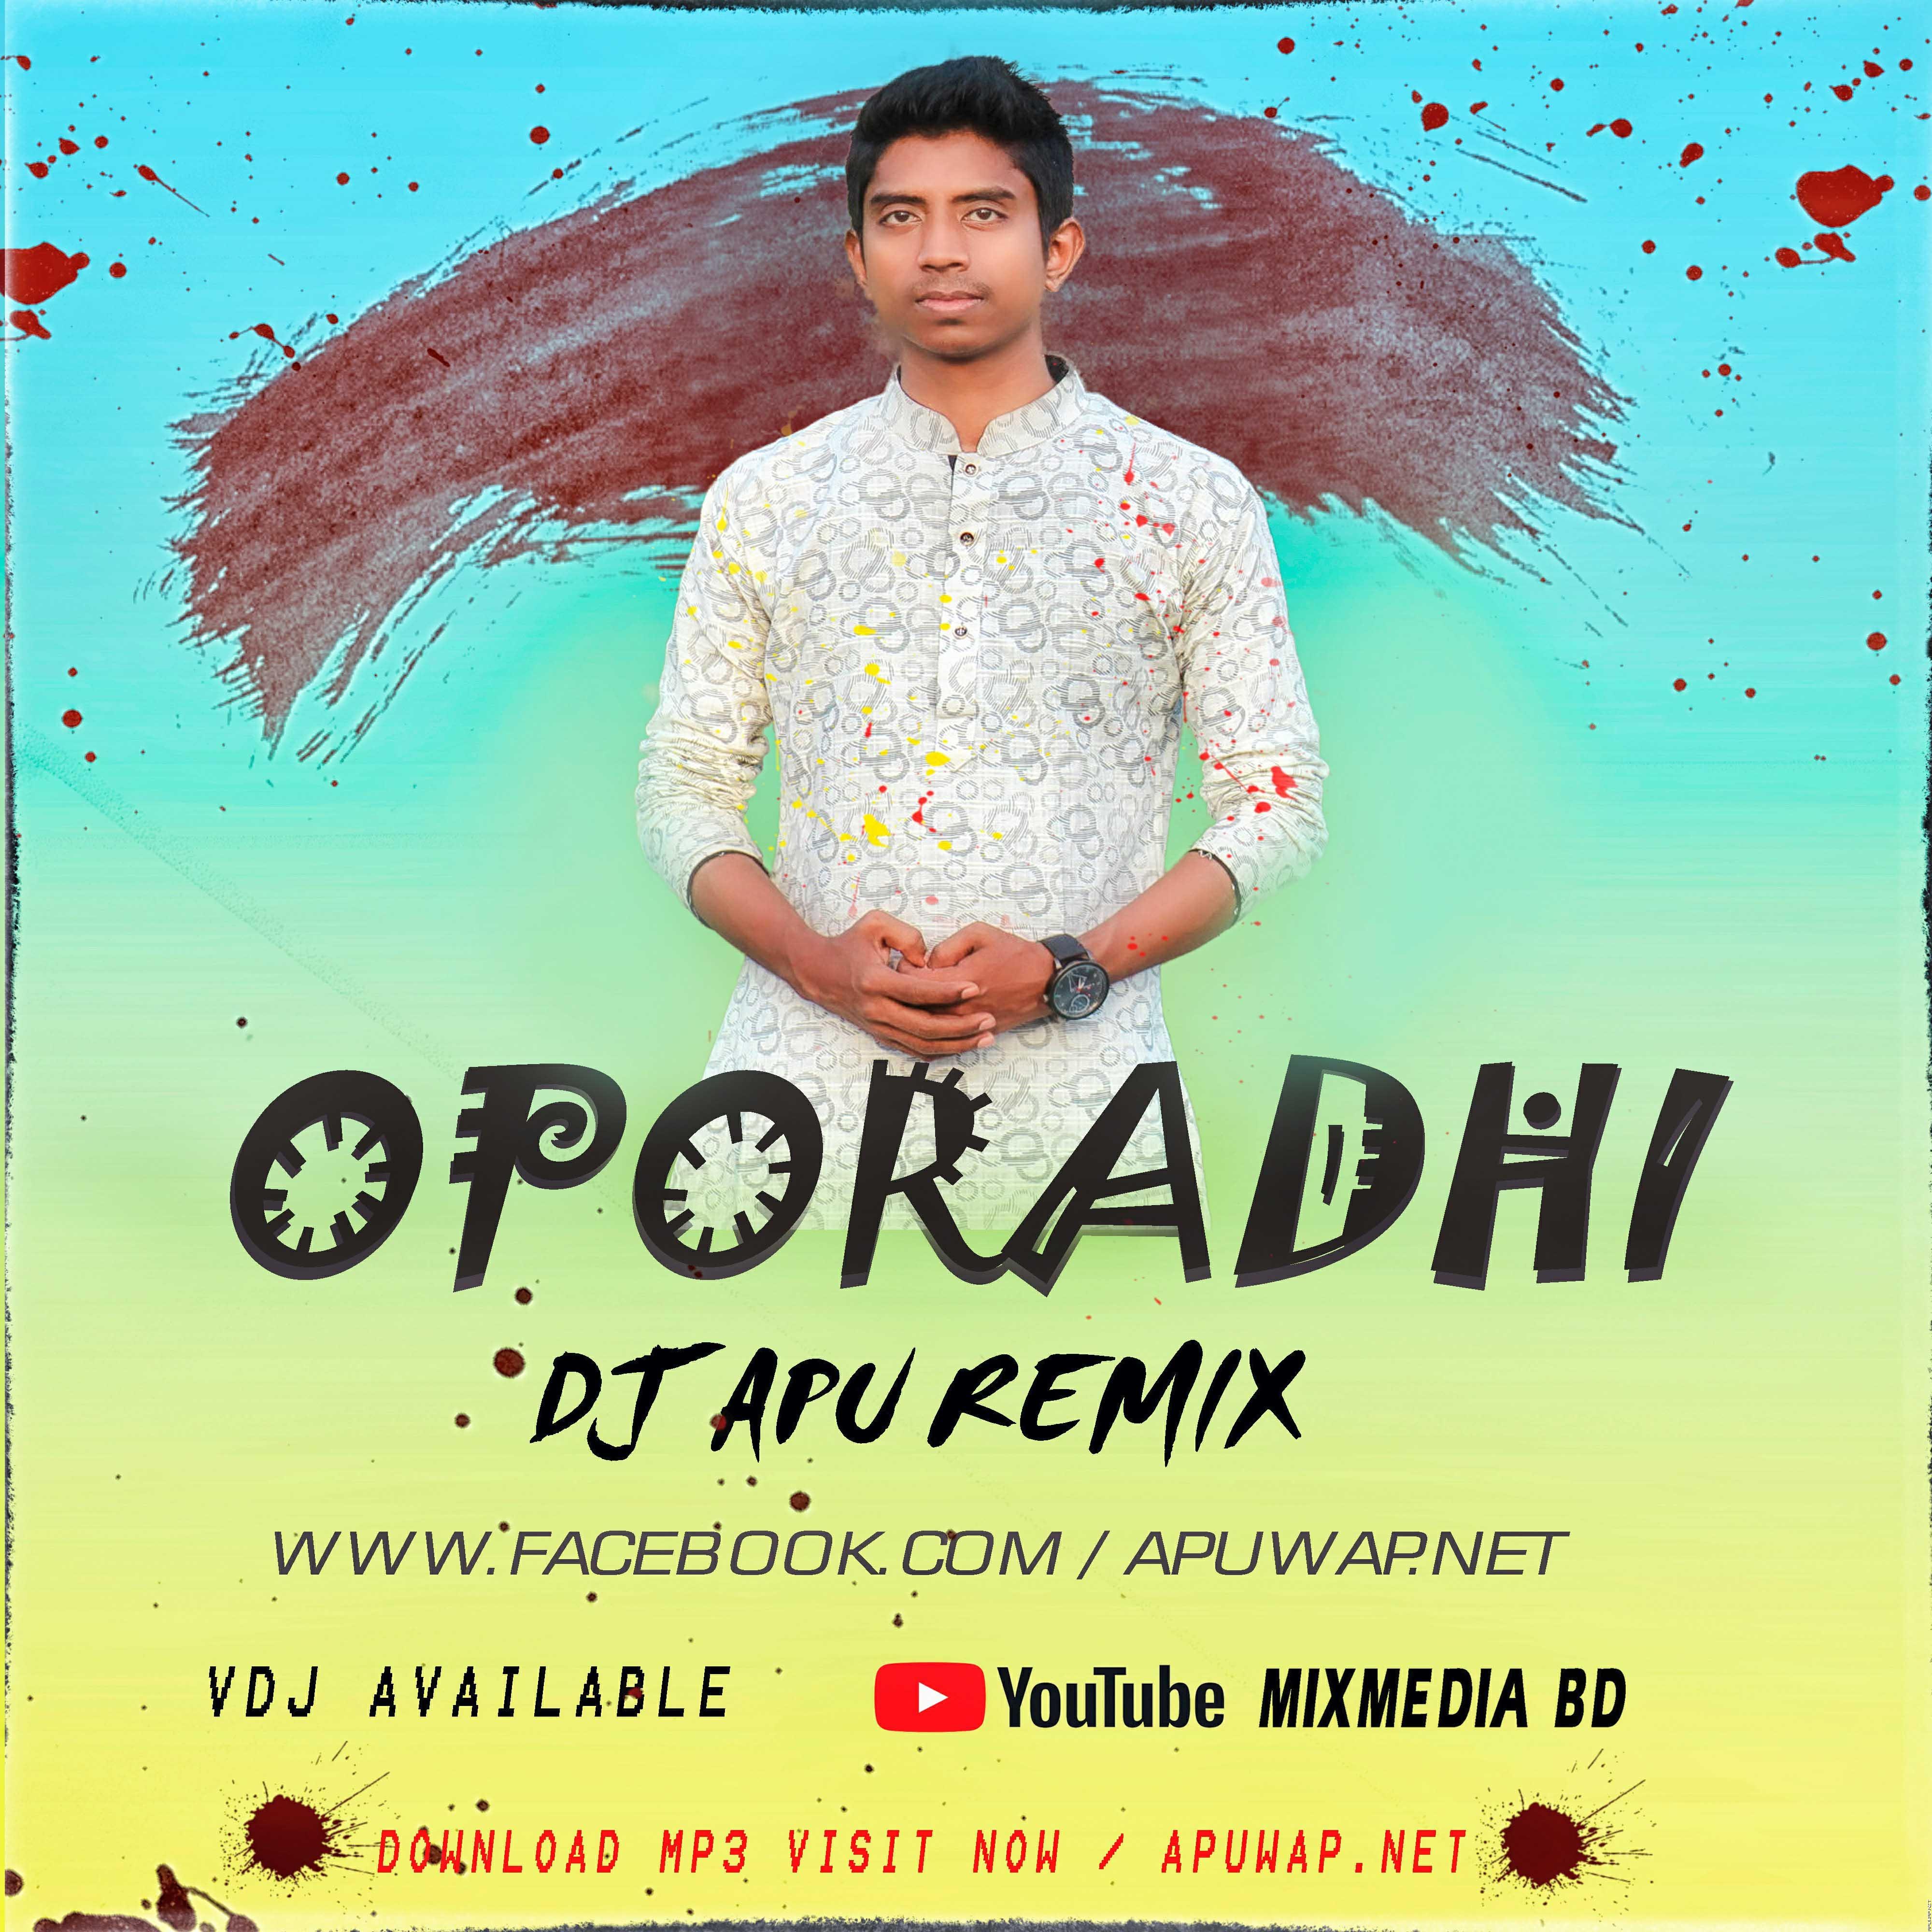 Oporadhi _ Ankur Mahamud Feat Arman Alif (Broken Love Mix ) Dj Apu (320Kbps).mp3